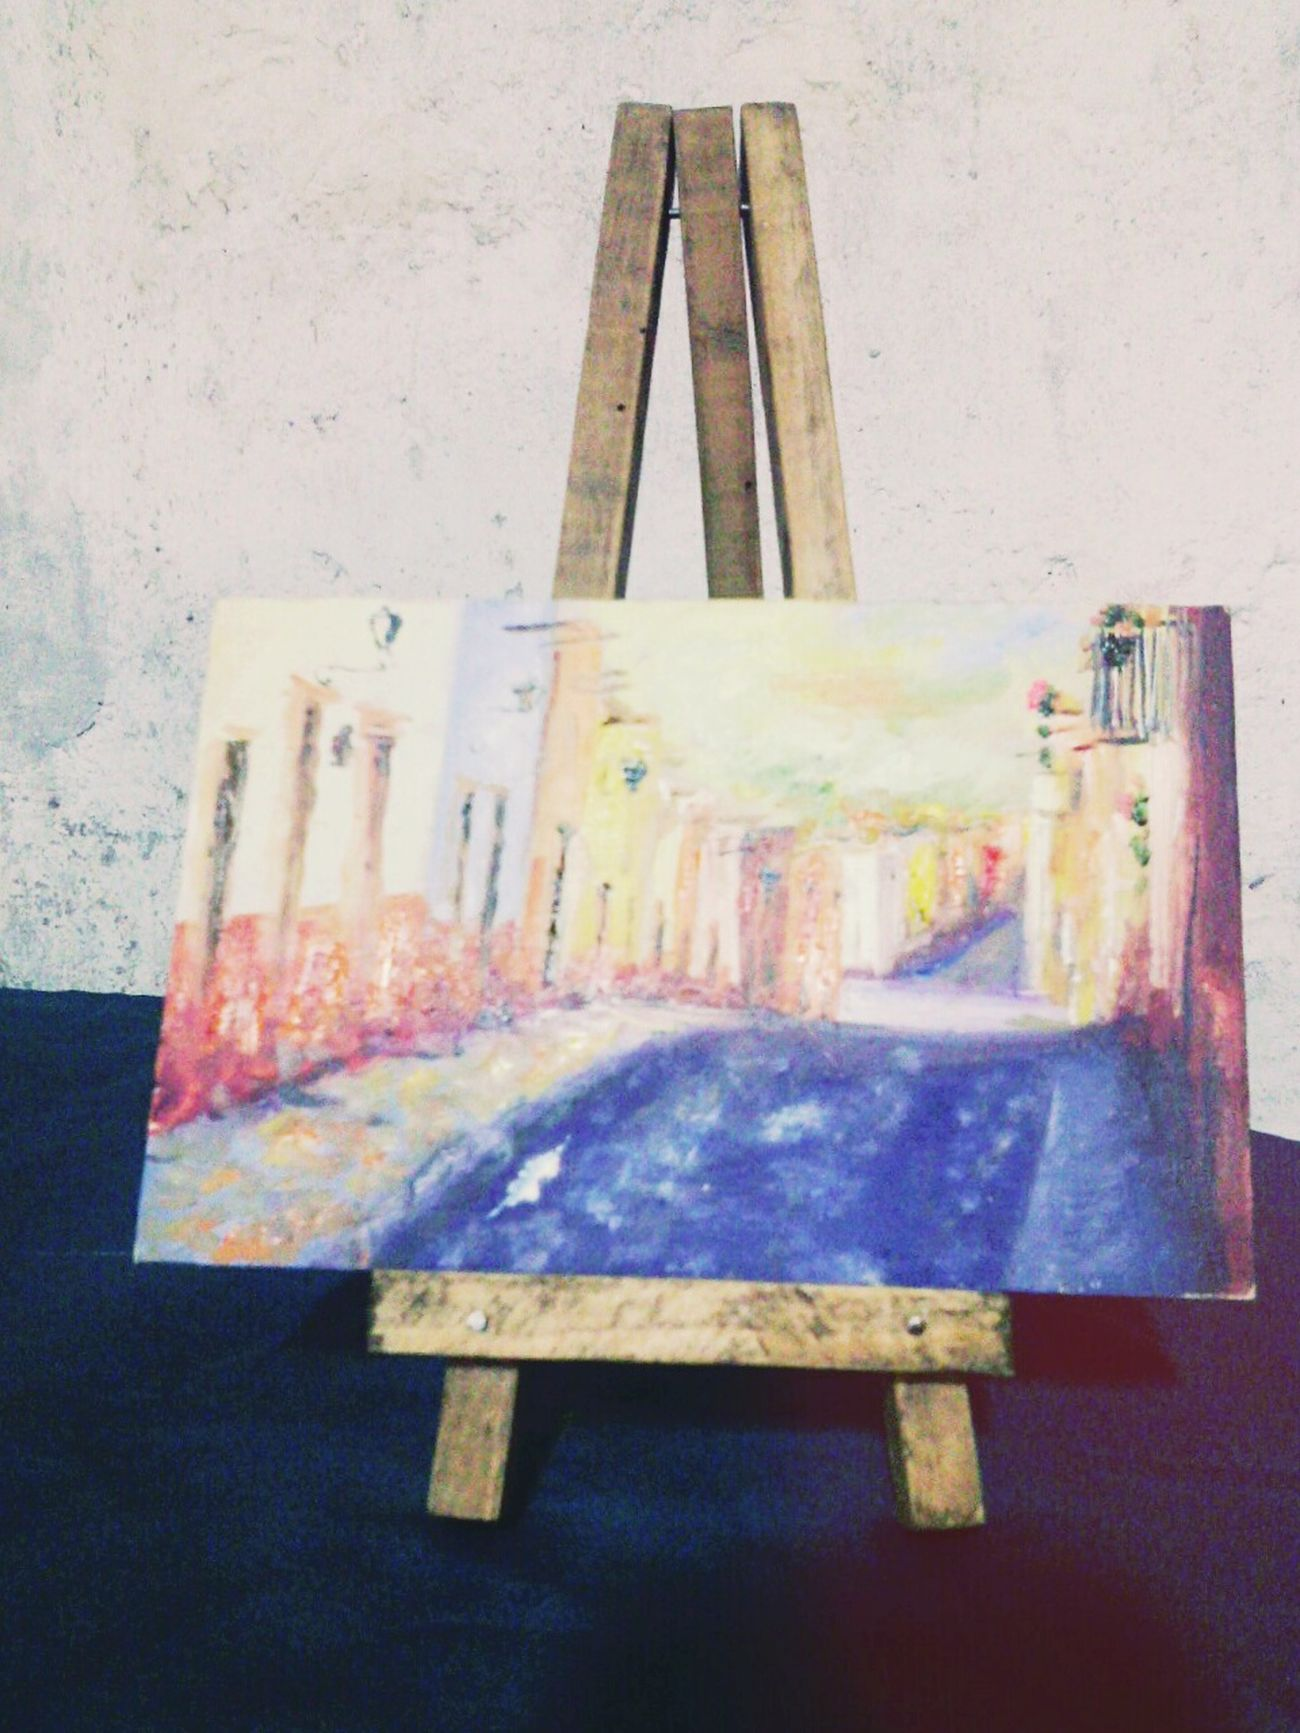 Paintbrush Art And Craft Paint Creativity Multi Colored No People SanMigueldeAllende🇲🇽 Guanajuato, México